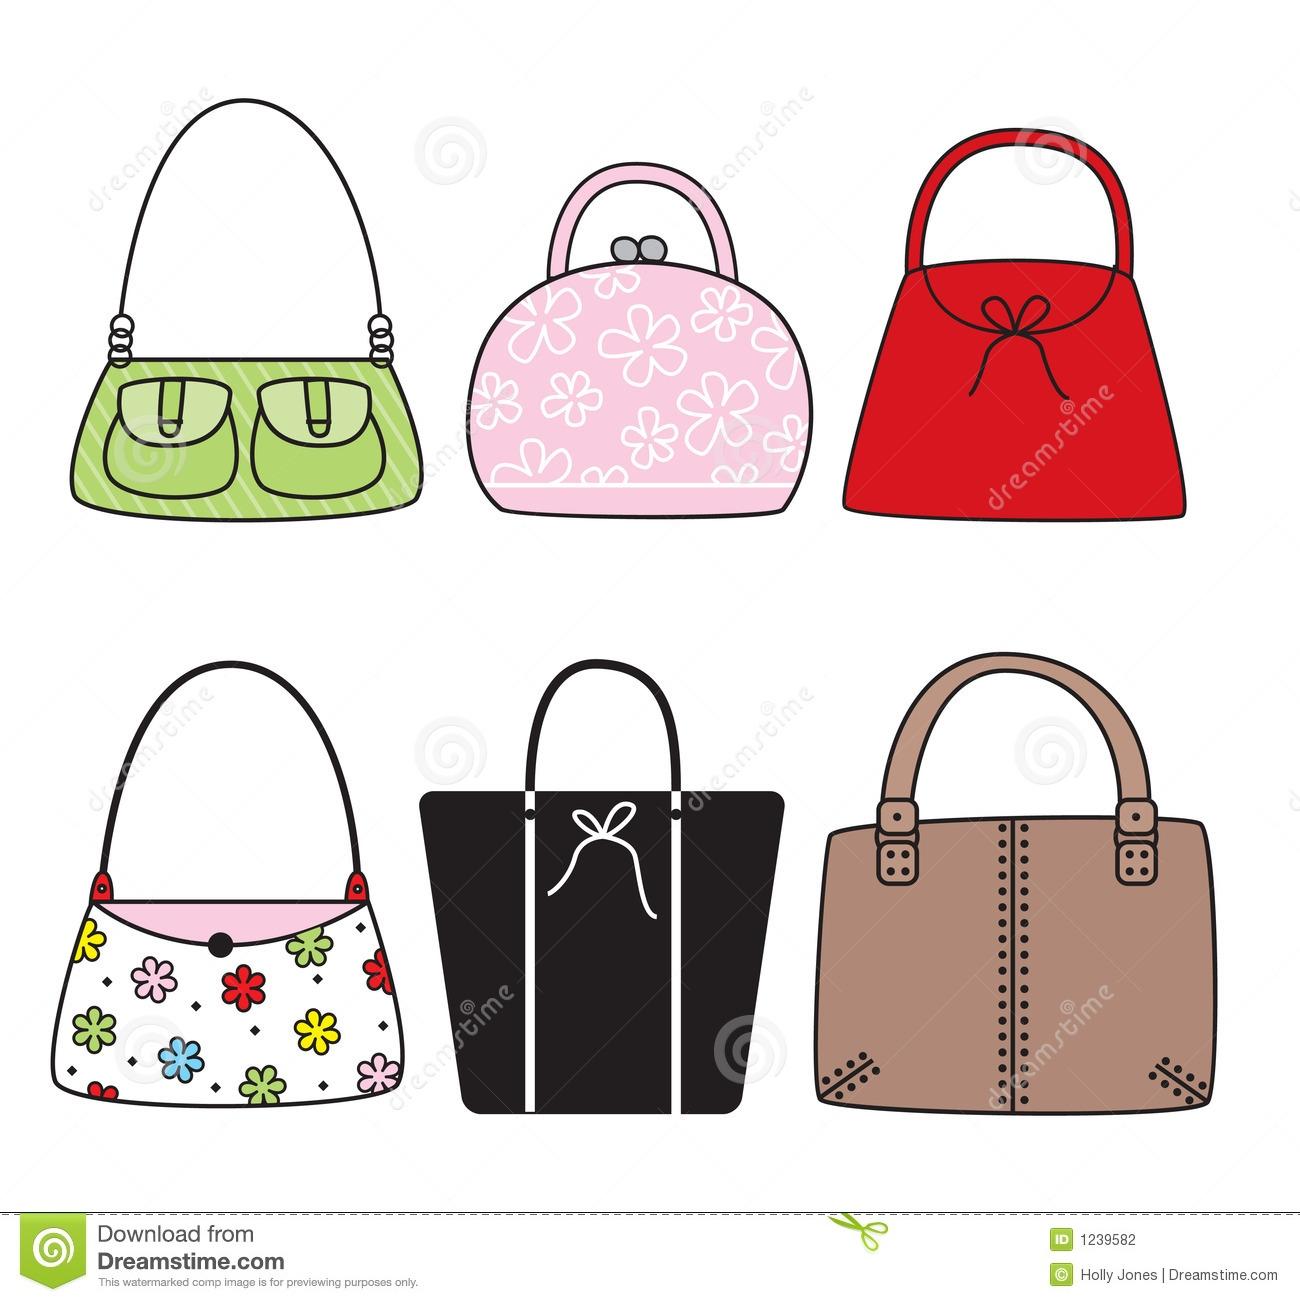 Purse clipart New Free handbag clipart Clipart Collection.